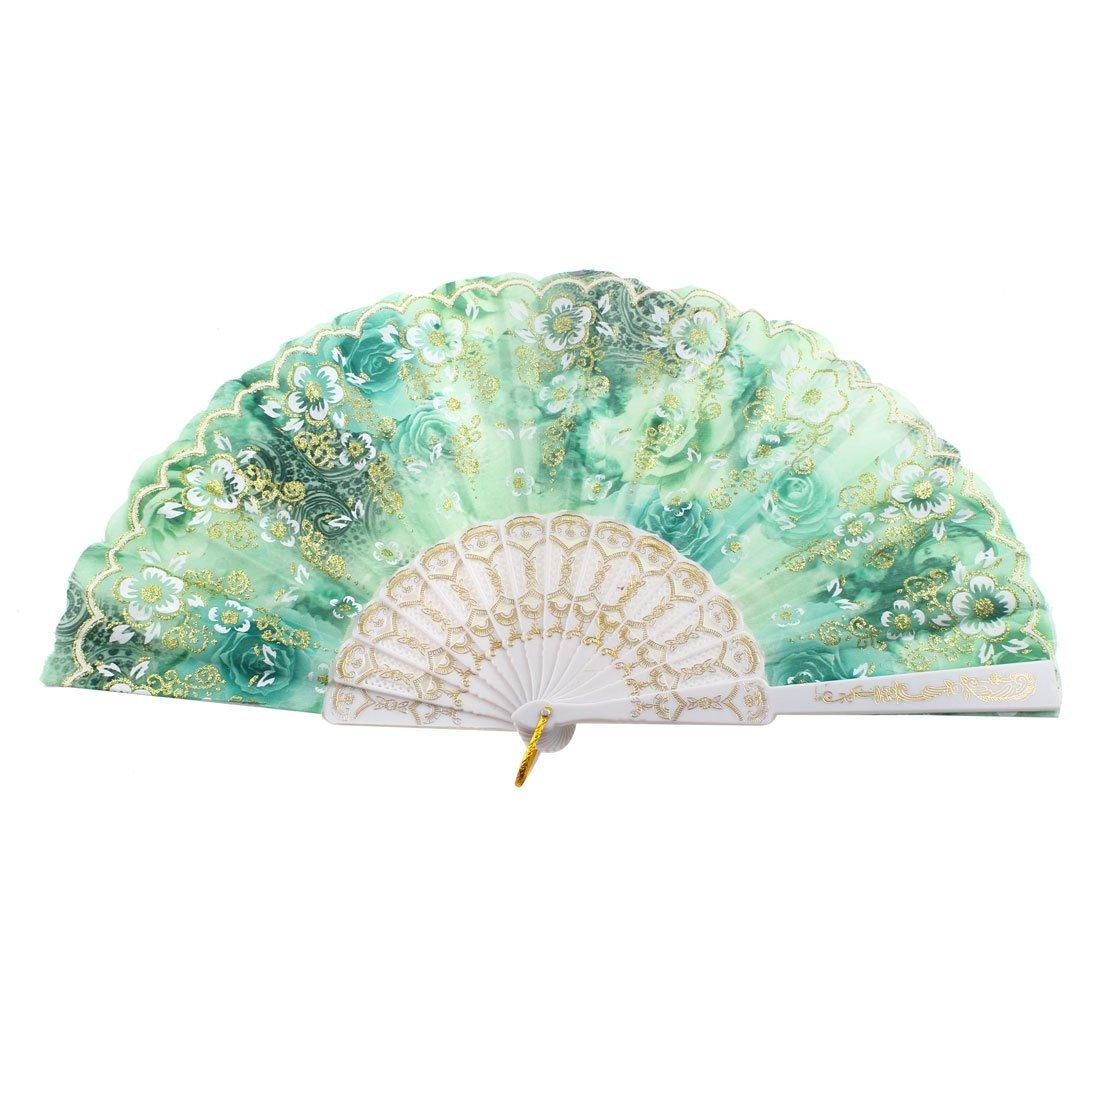 uxcell Glittery Powder Decor Flower Printed Folded Hand Fan Green